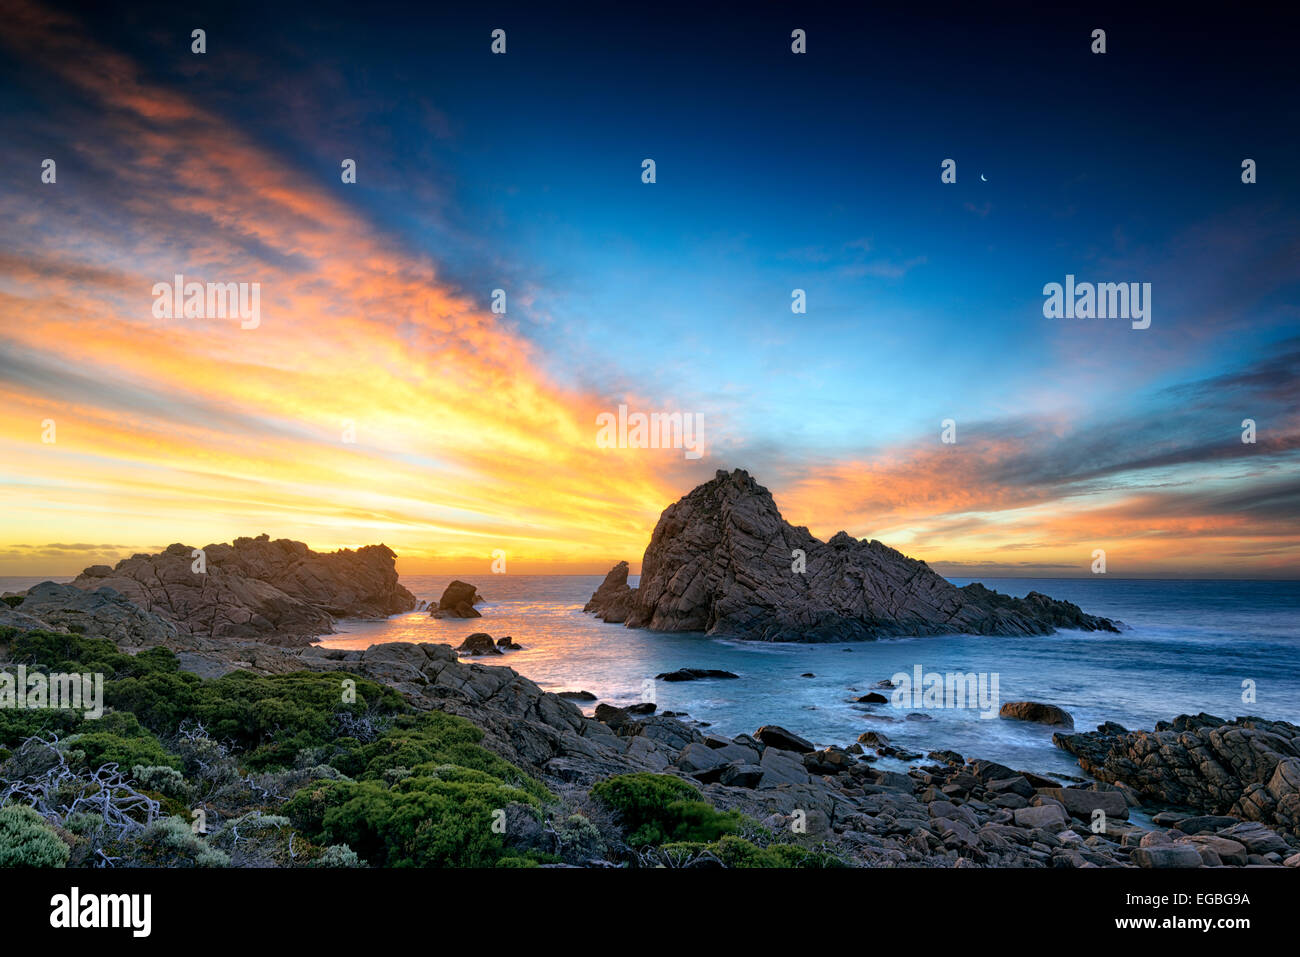 Donsborough Rock, Sugarloaf, Australie occidentale Photo Stock